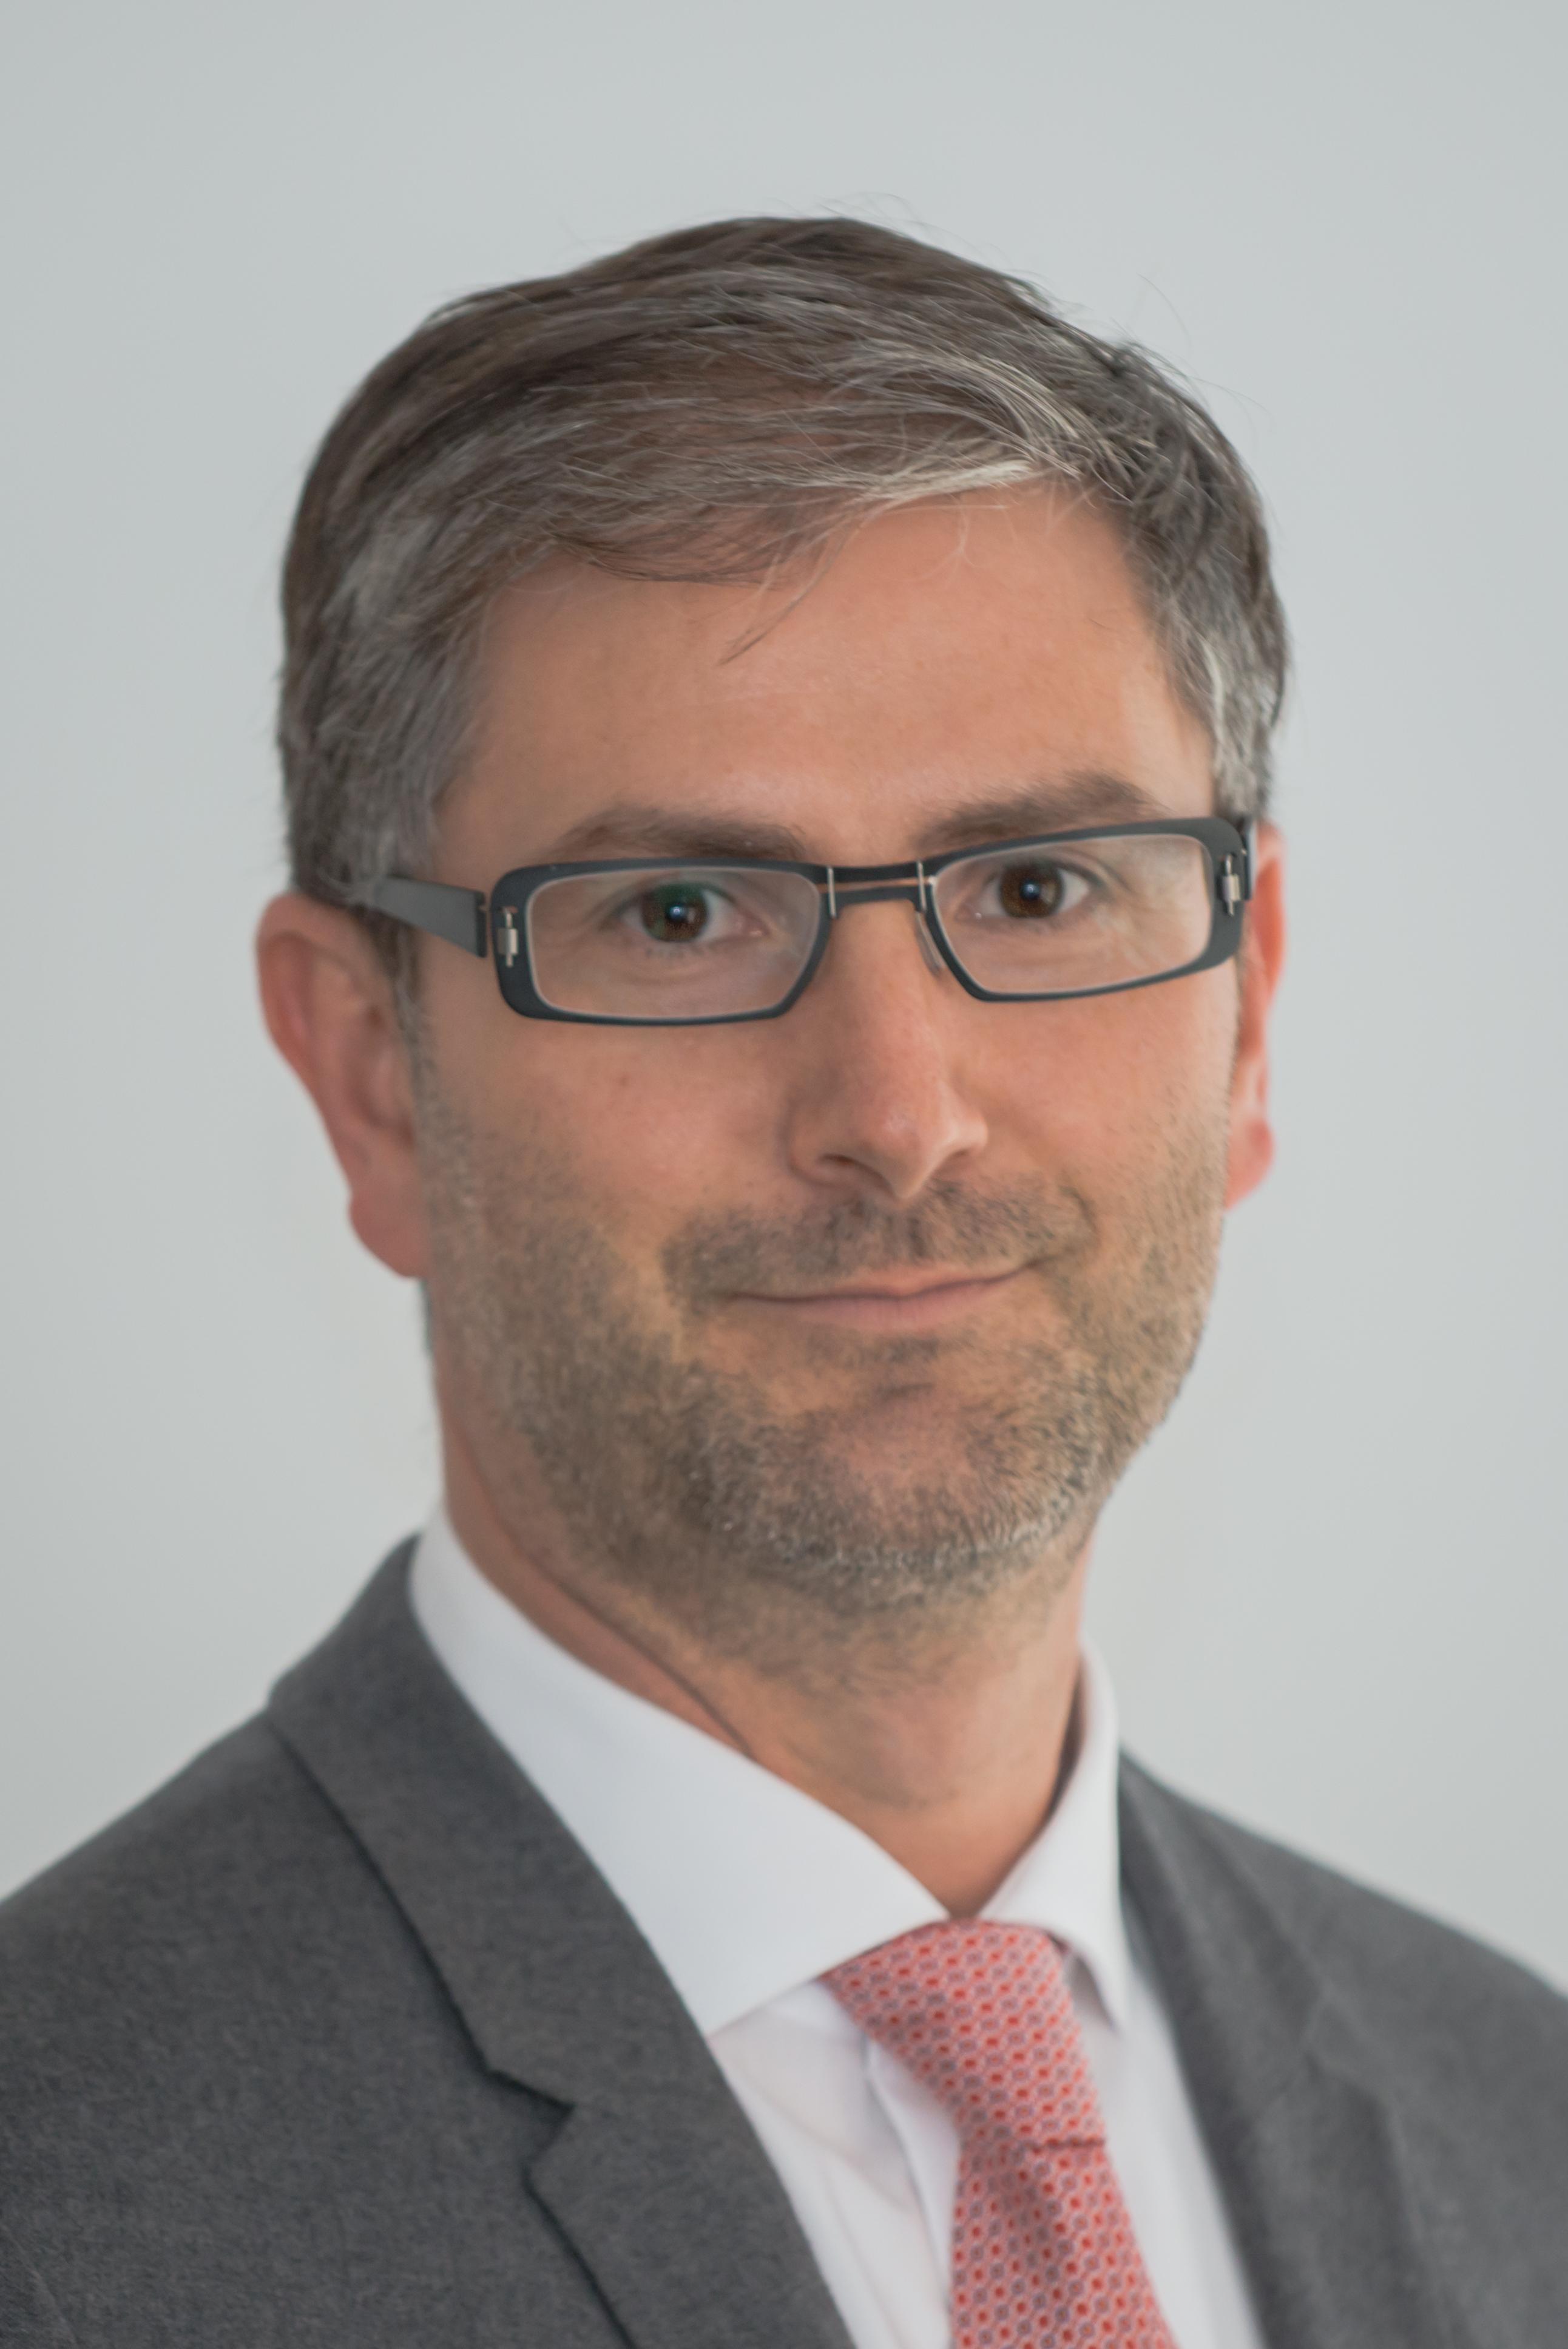 Schnitzer Group Thomas Schuol